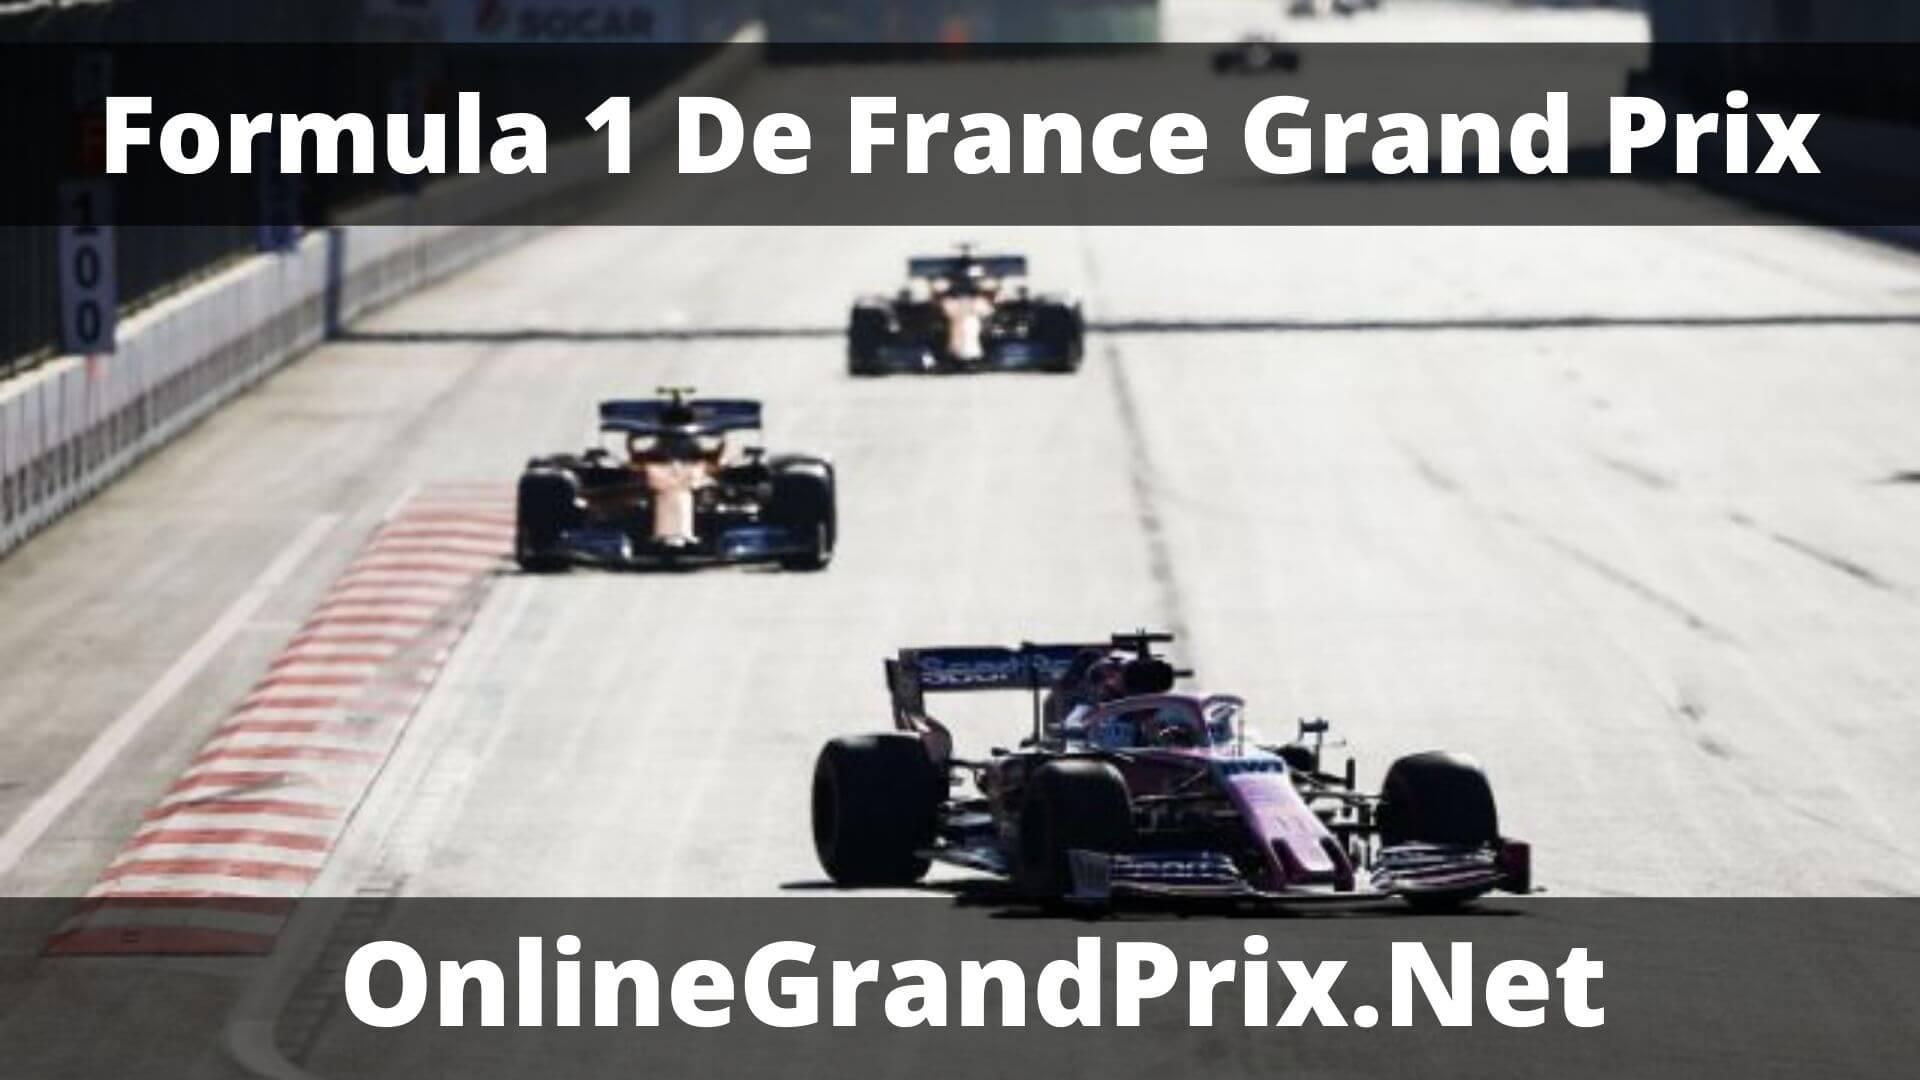 F1 Practice 2 De France GP Live Stream 2020